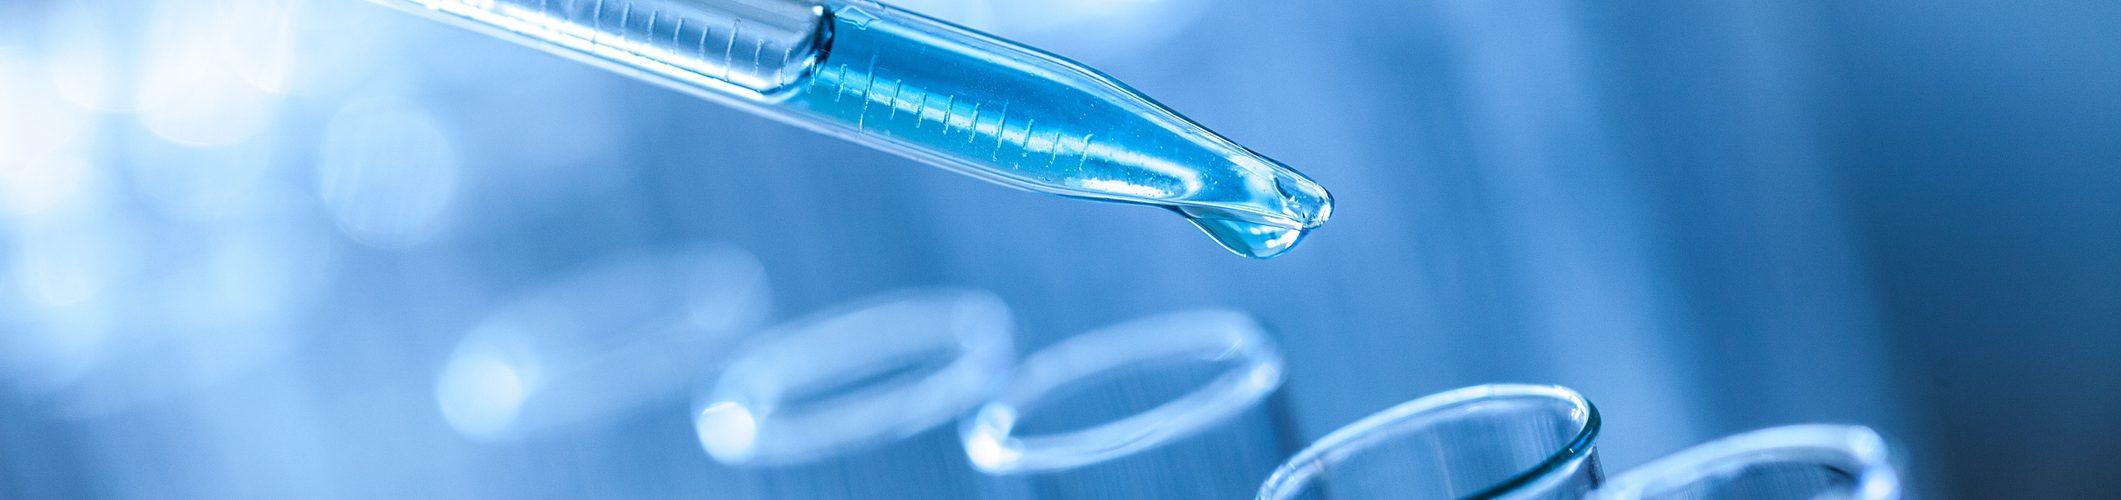 Science laboratory test tubes, laboratory equipment